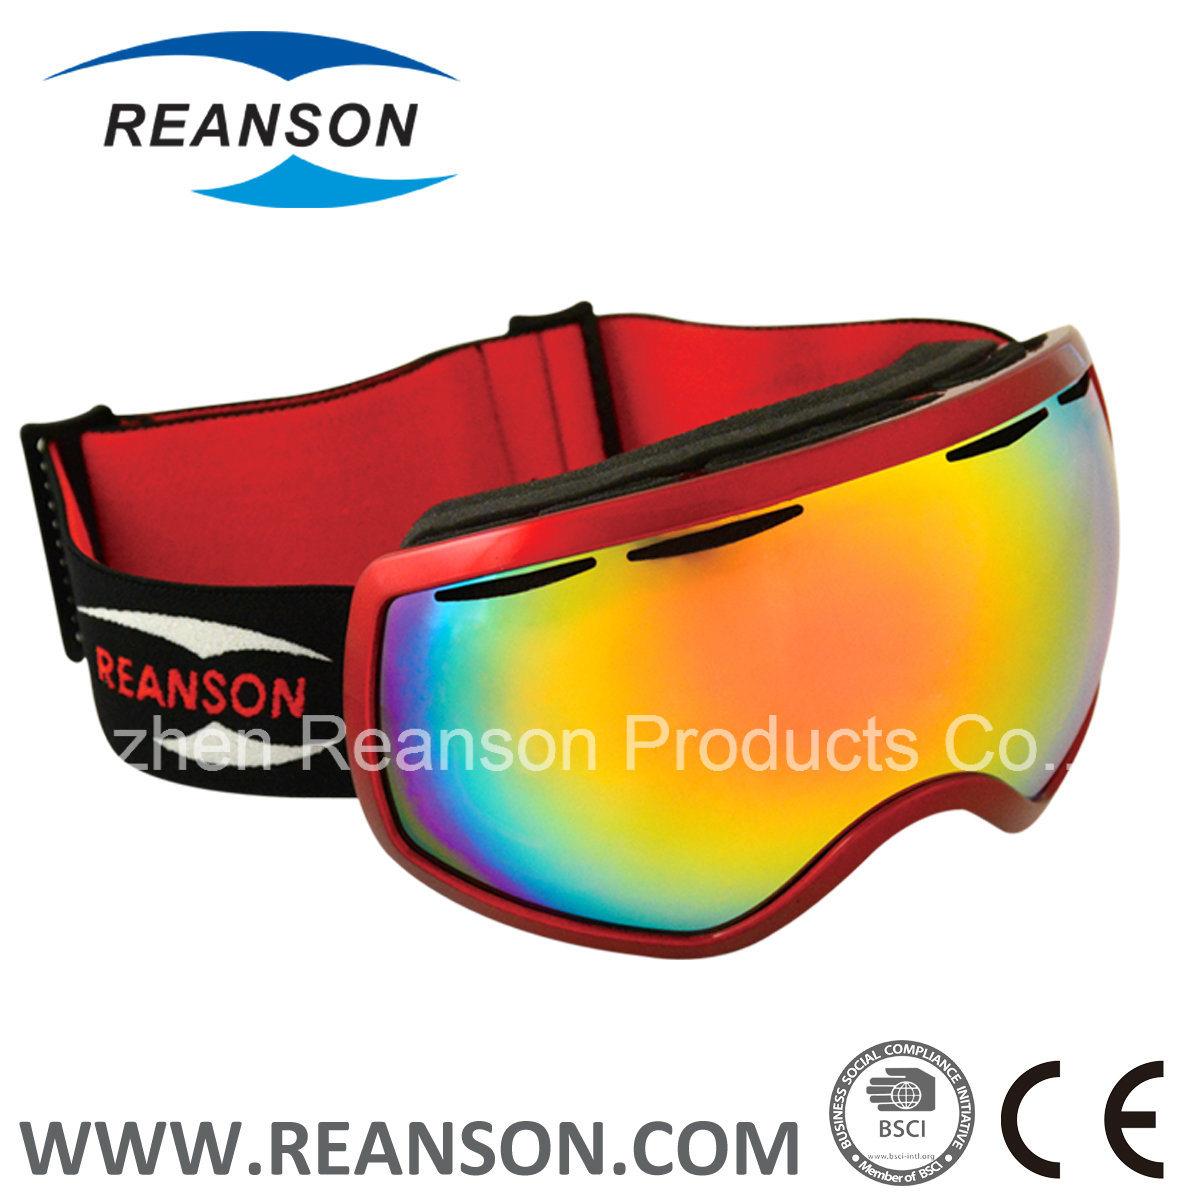 Reanson Double Lenses Anti-Fog Skiing Goggles